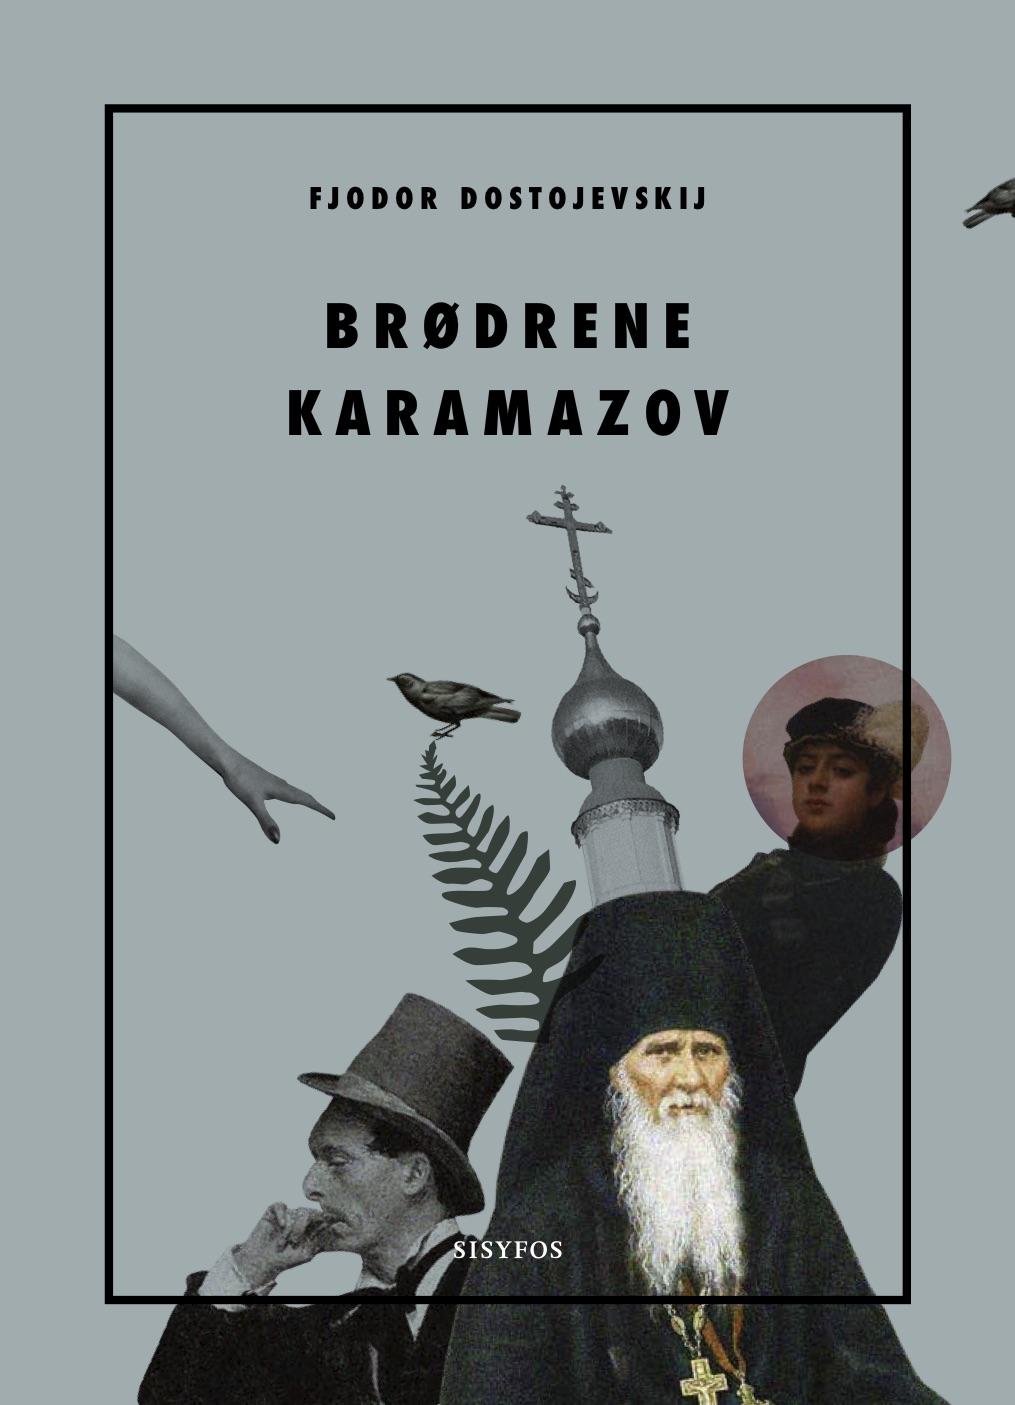 Brødrene Karamazov - Fjodor Dostojevskij - Bøger - Forlaget Sisyfos - 9788799916986 - November 5, 2020